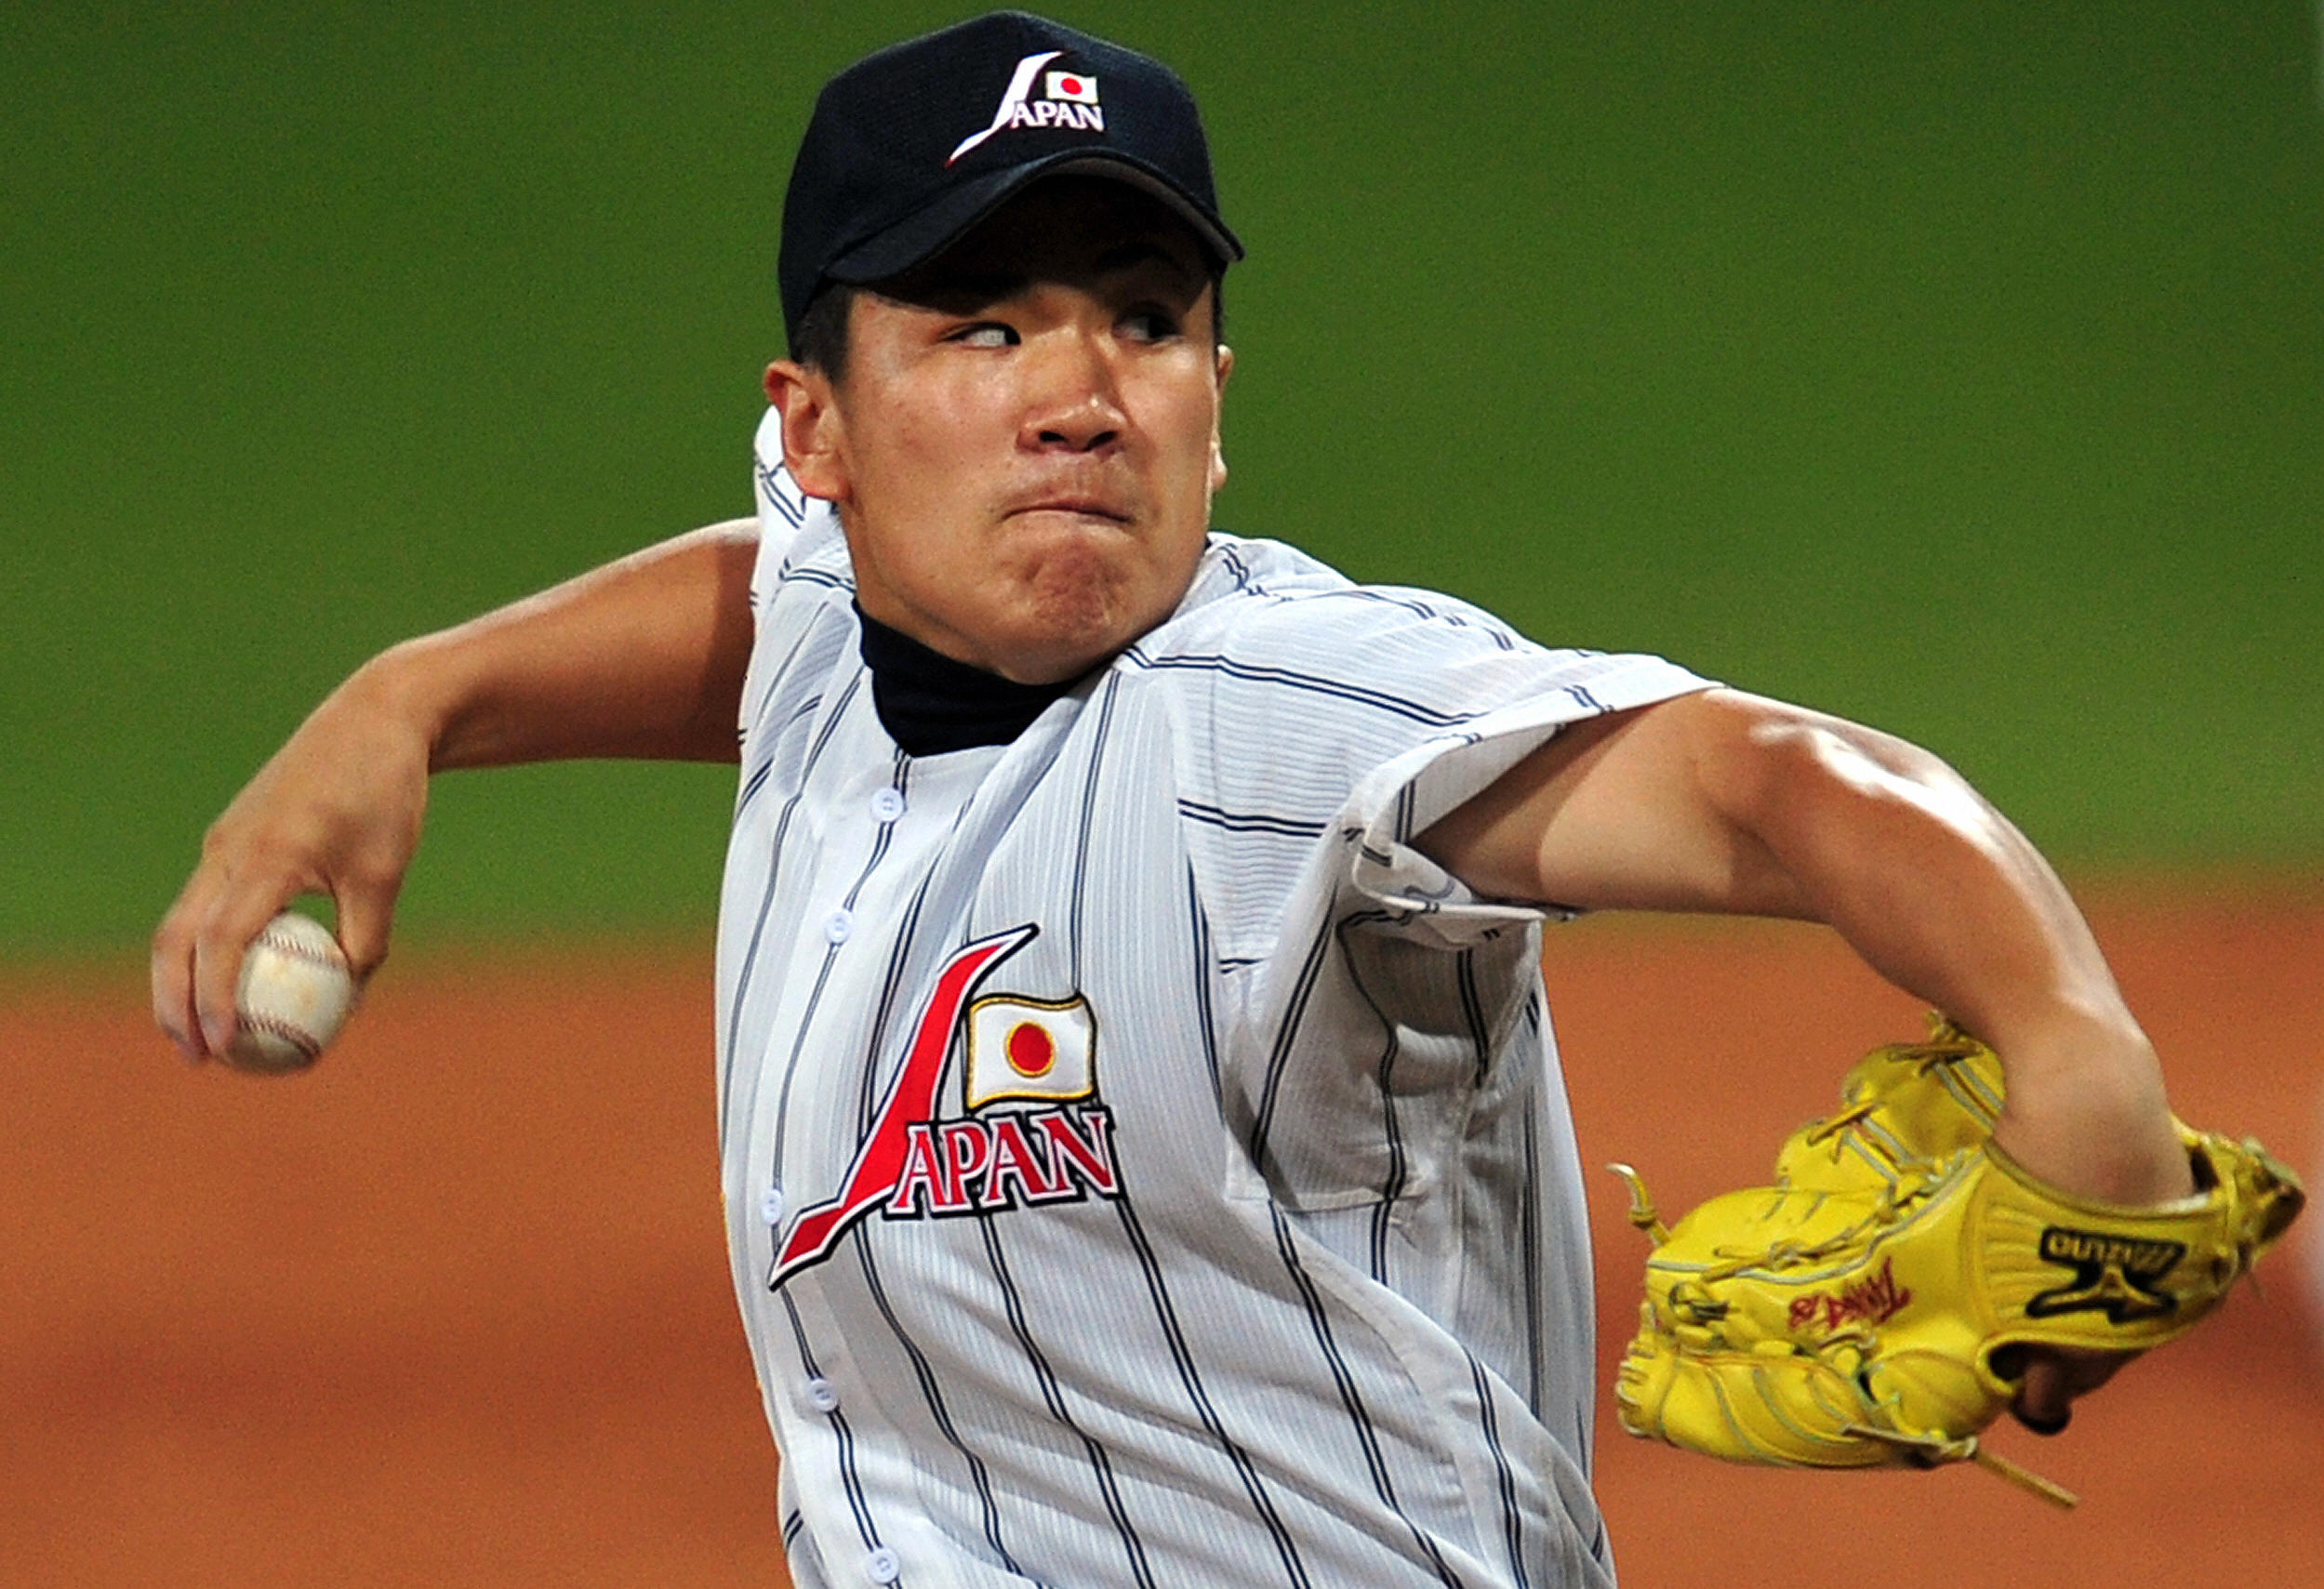 Japan's relief pitcher Masahiro Tanaka w